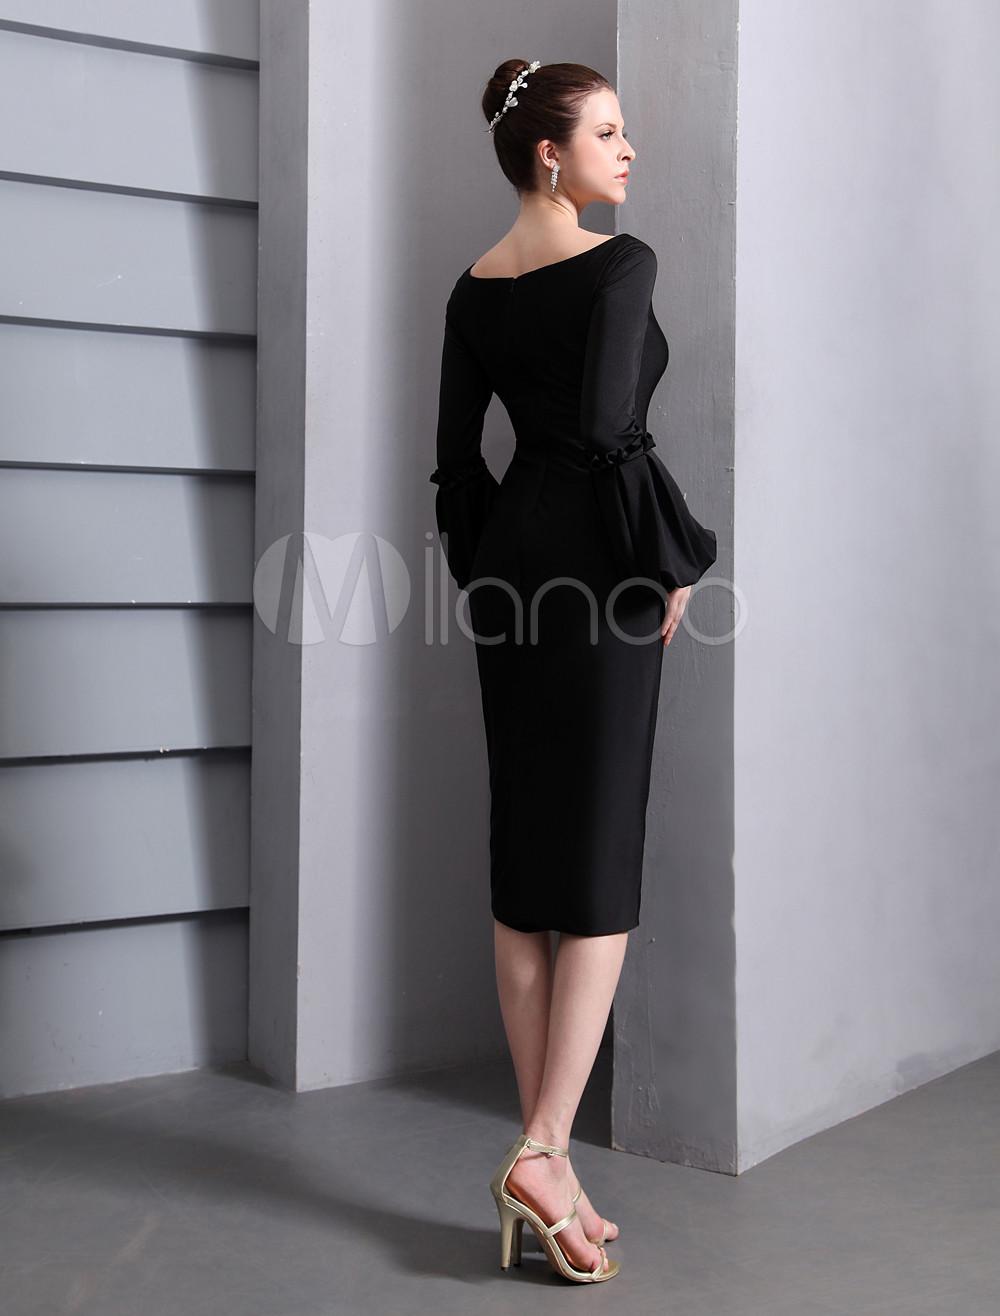 Chic-Black-Scoop-Neck-Sheath-Chiffon-Cannes-Film-Festival-Dress-308208